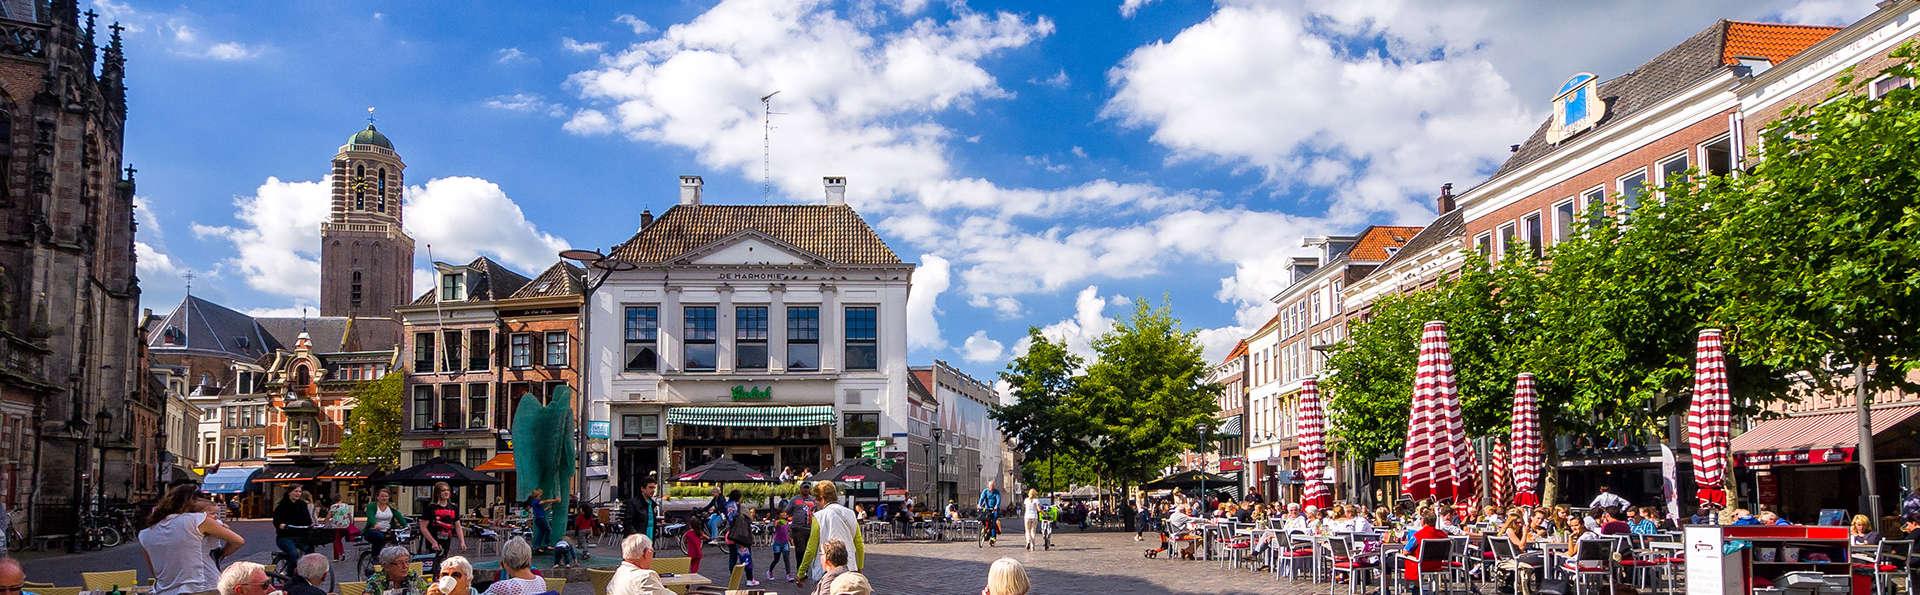 Fletcher Hotel-Restaurant Veldenbos - Edit_Zwolle.jpg